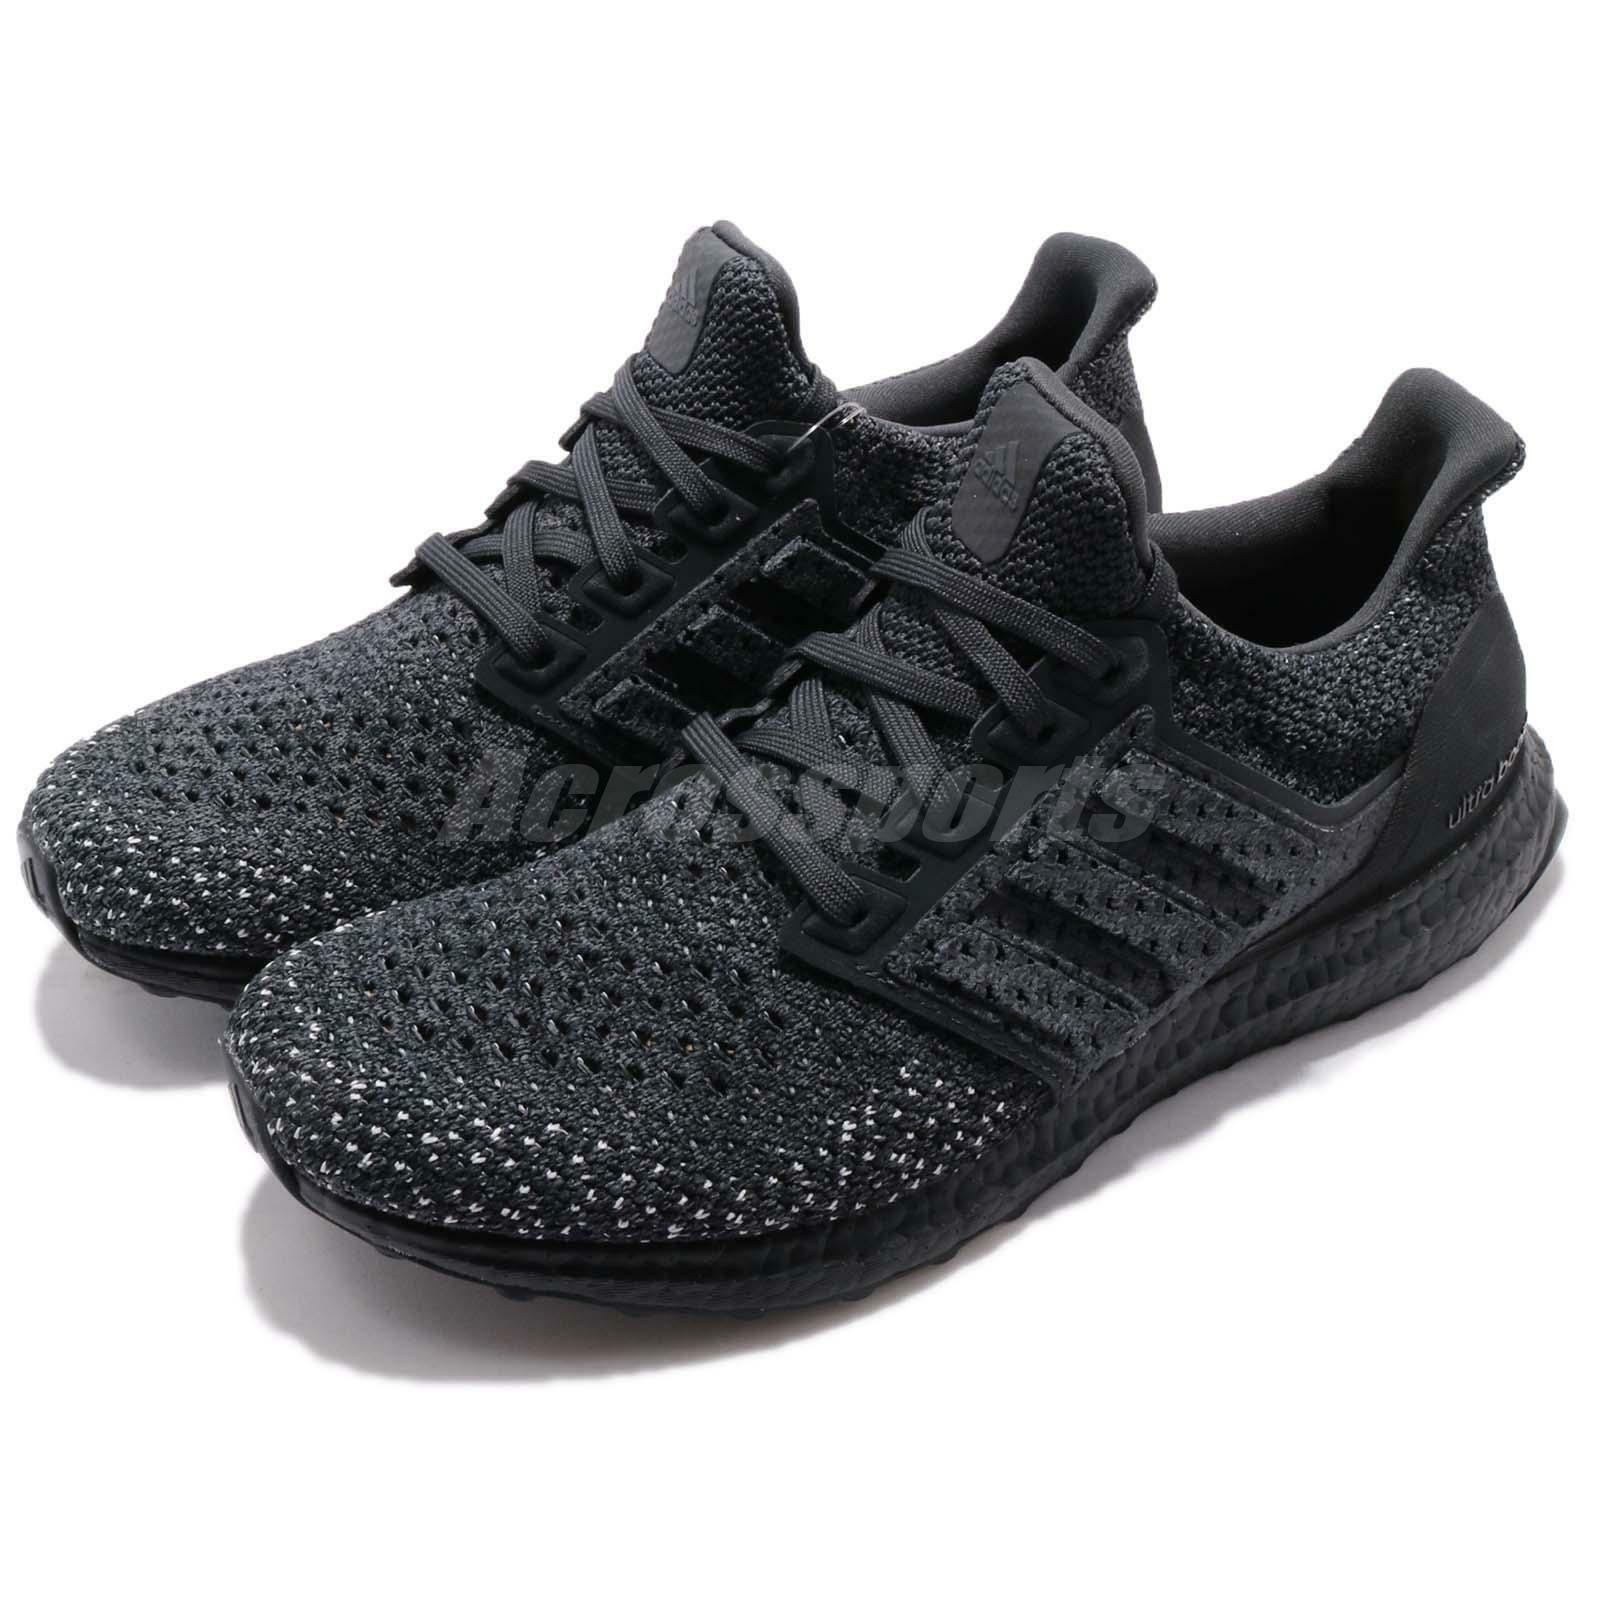 Adidas Ultra BOOST Clima LTD 4.0 Carbon negro Men Running zapatos zapatillas CQ0022